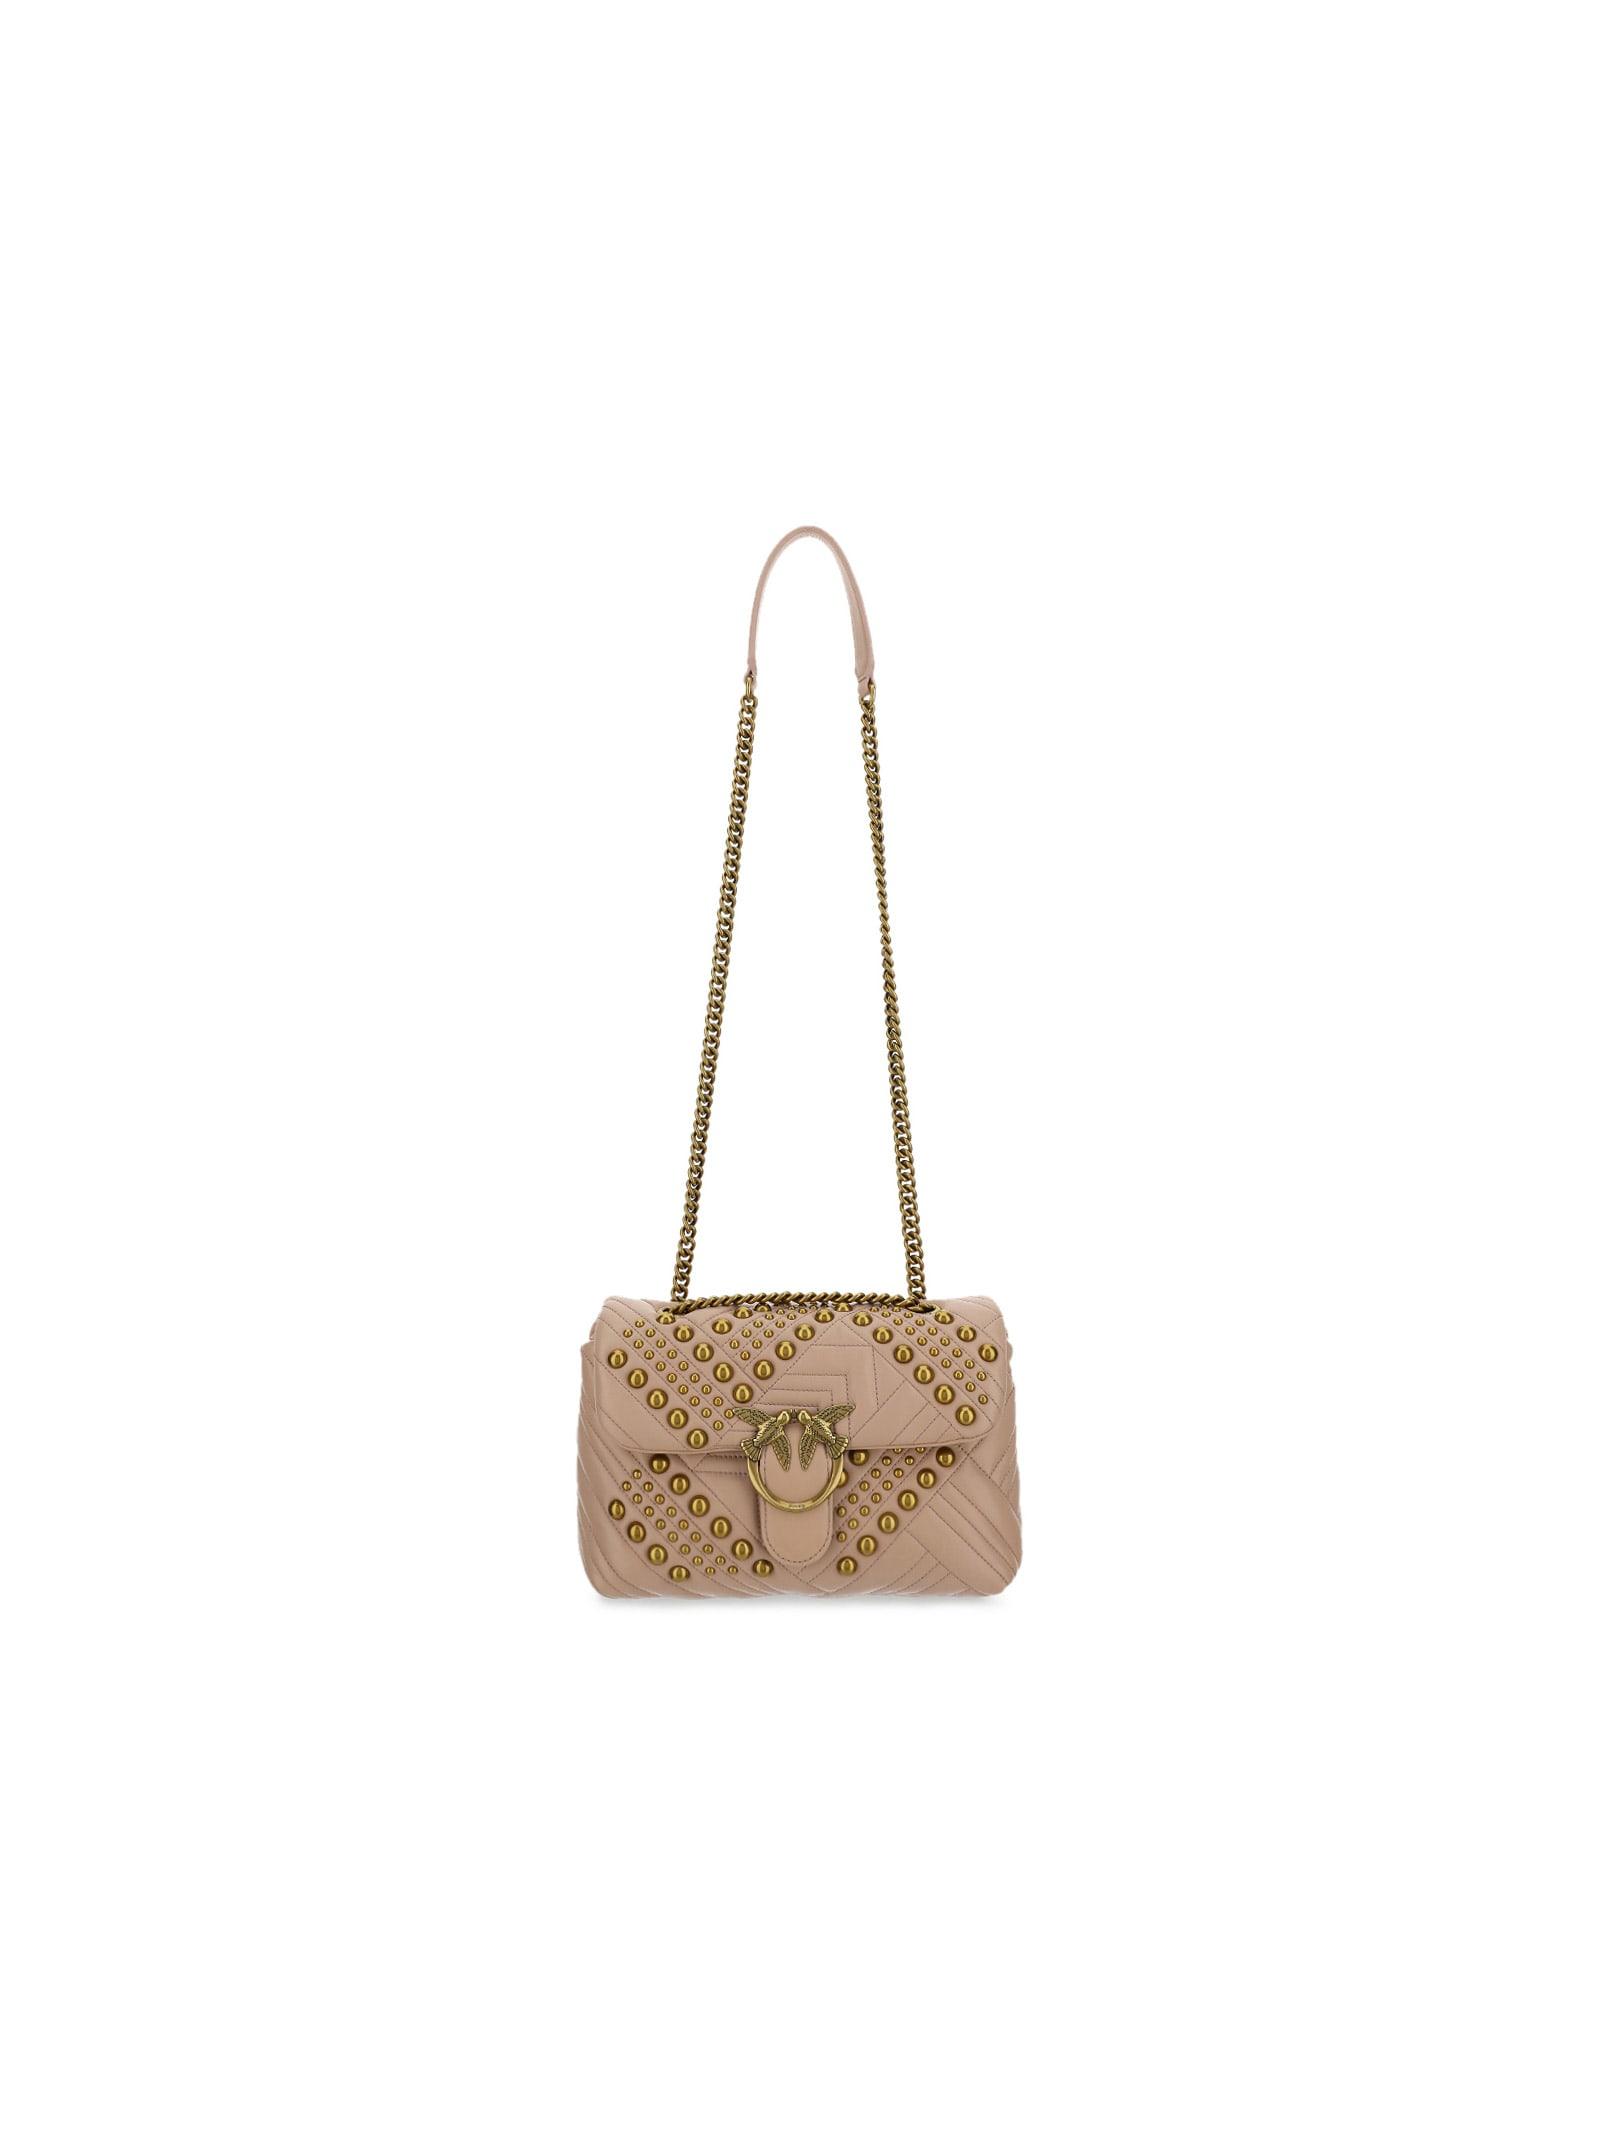 Pinko Leathers LOVE CLASSIC SHOULDER BAG